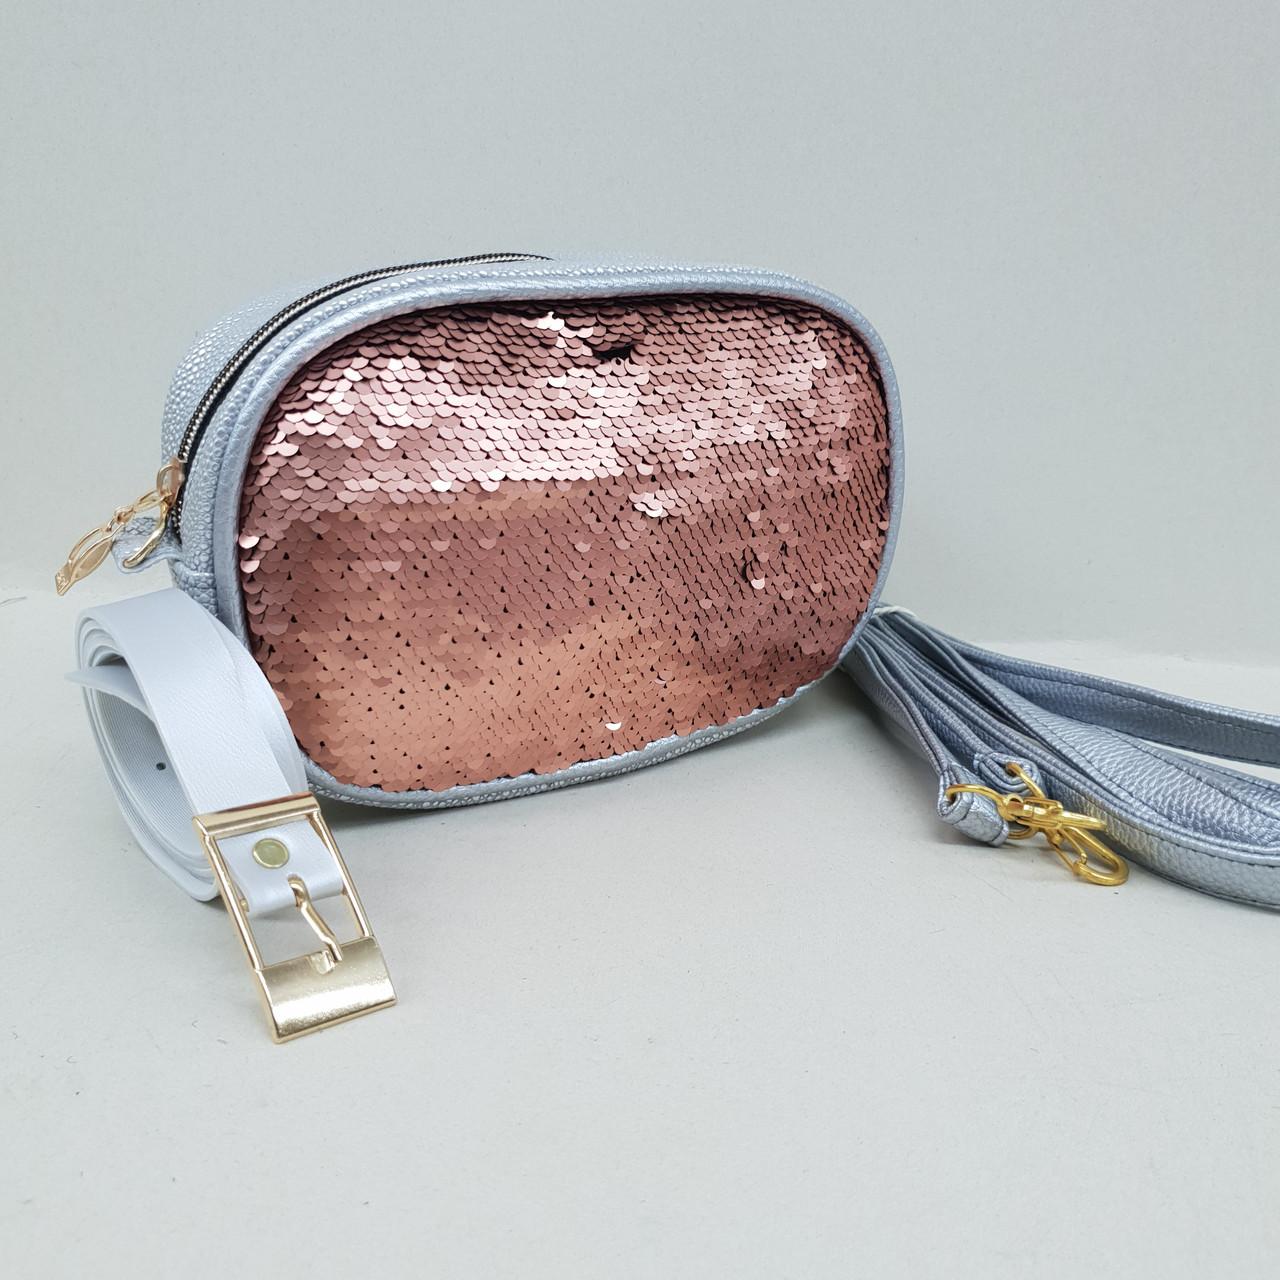 22f226875d57 Поясная сумка Шанель  продажа, цена в Харькове. мужские сумки и ...